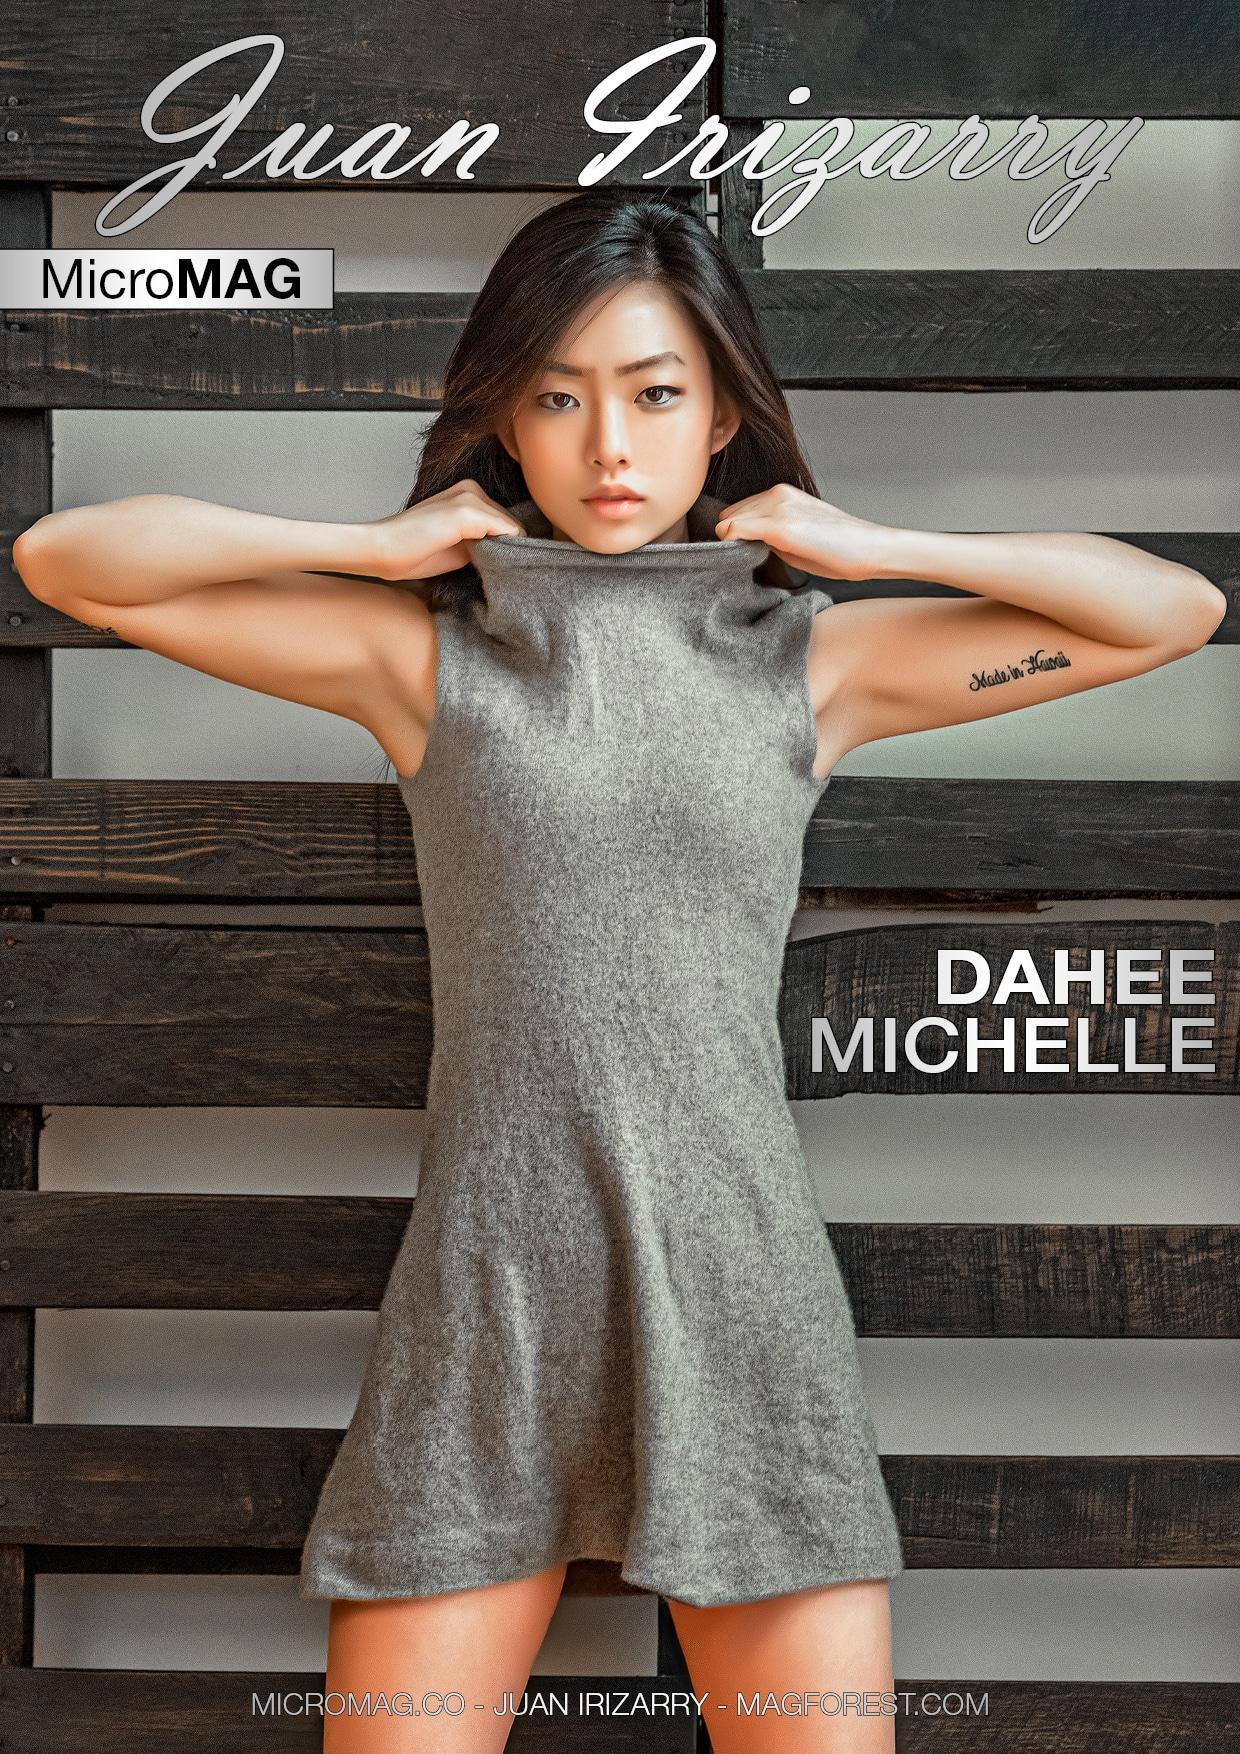 Juan Irizarry MicroMAG - Dahee Michelle - Issue 2 2